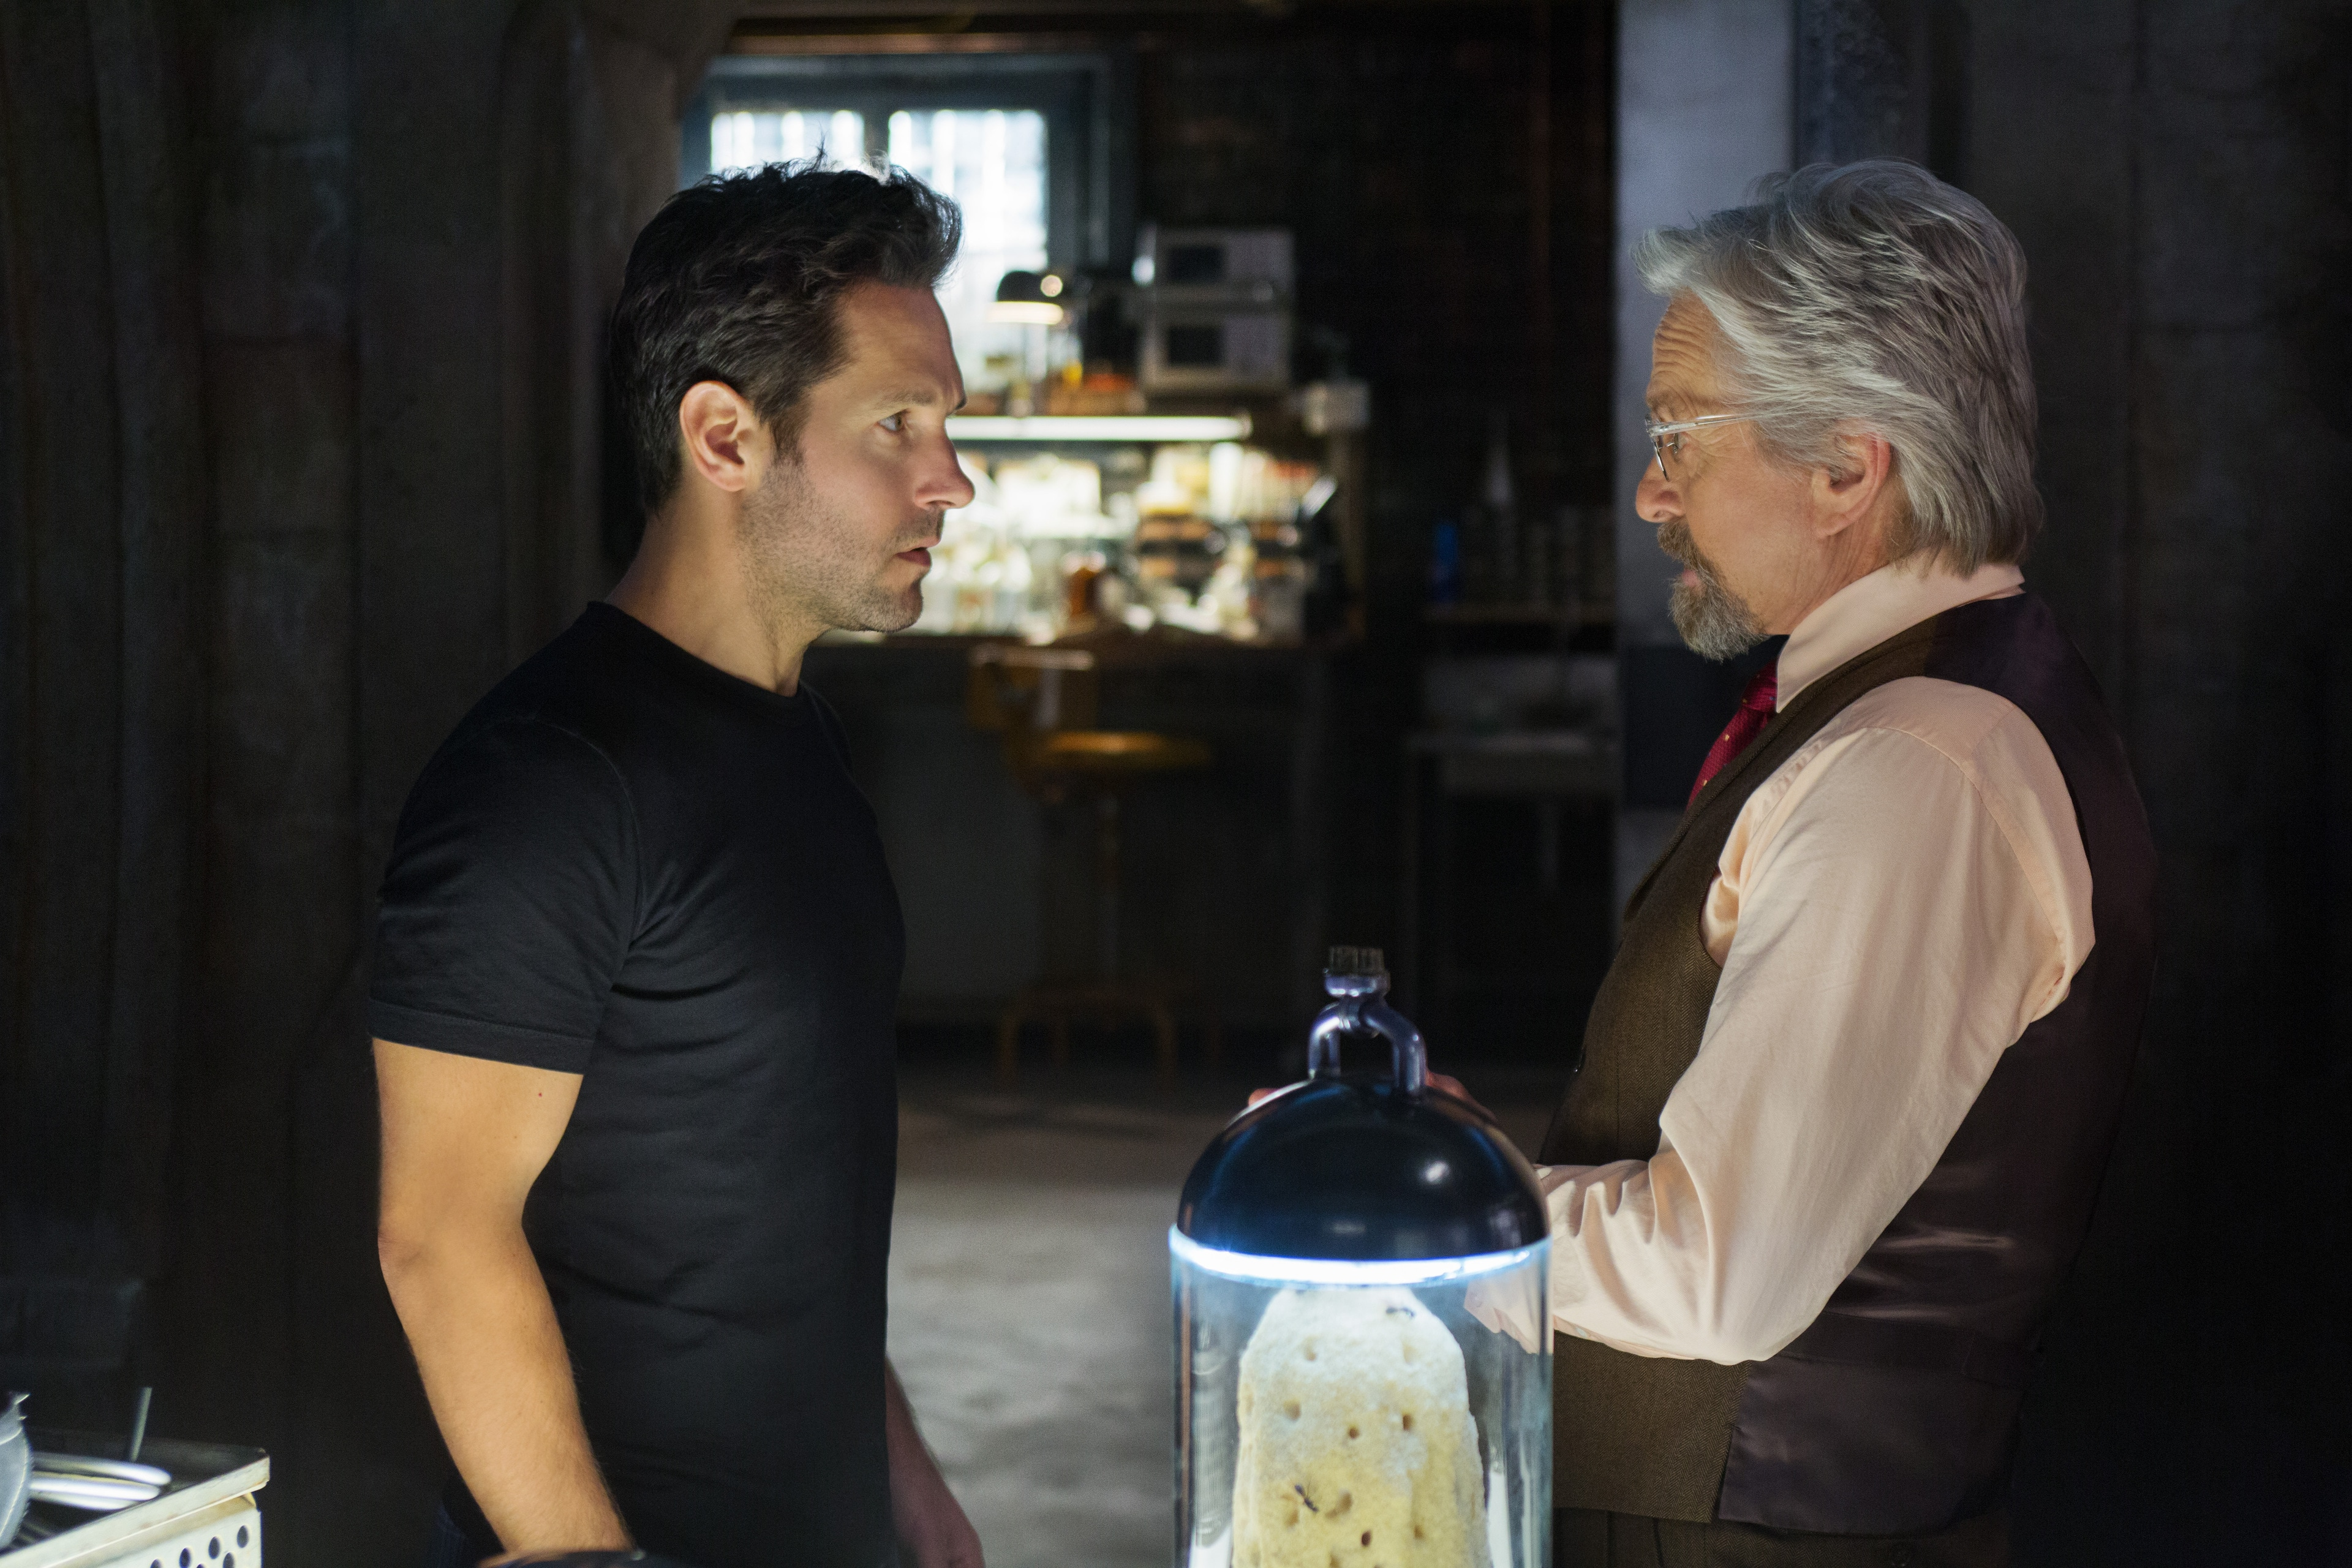 Paul Rudd (as Scott Lang) and Michael Douglas (as Hank Pym) in Ant-Man